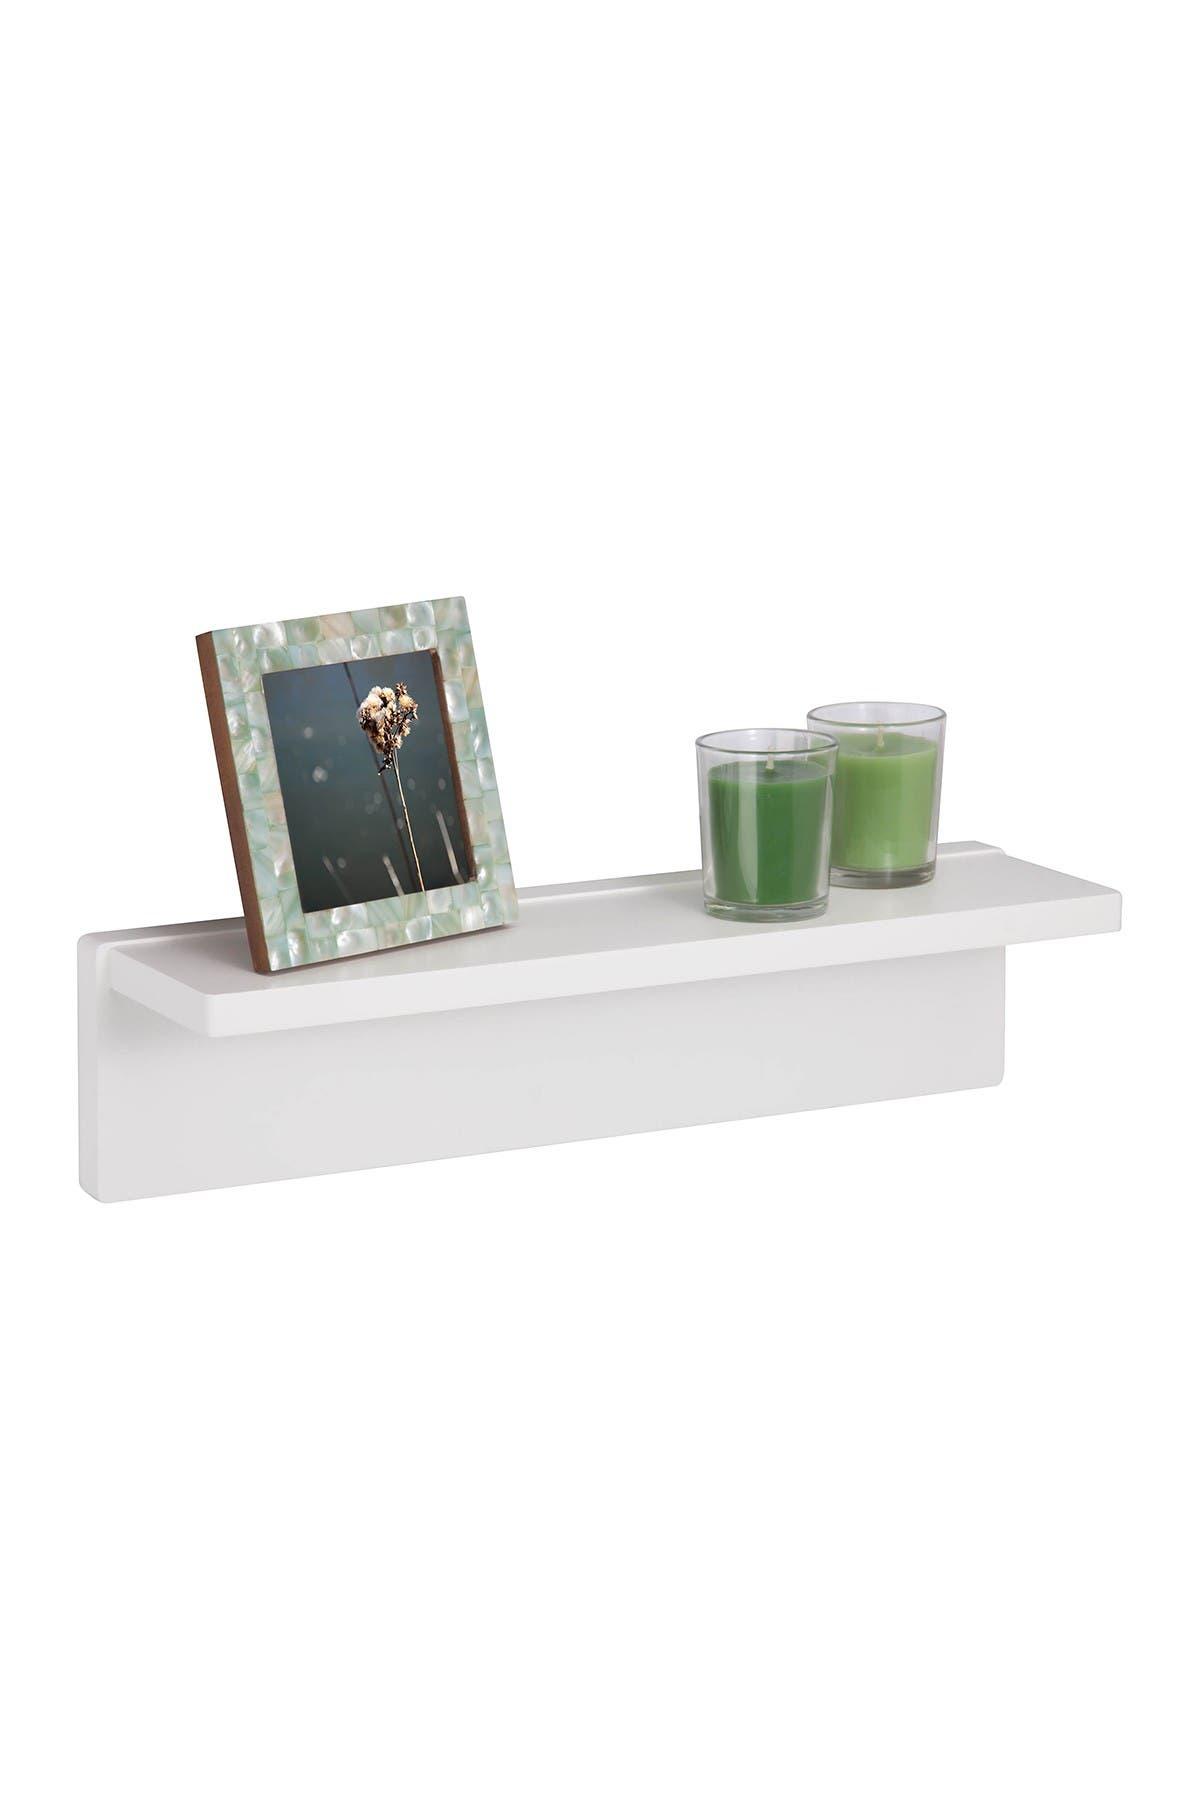 Image of Honey-Can-Do White L Shape Wall Shelf